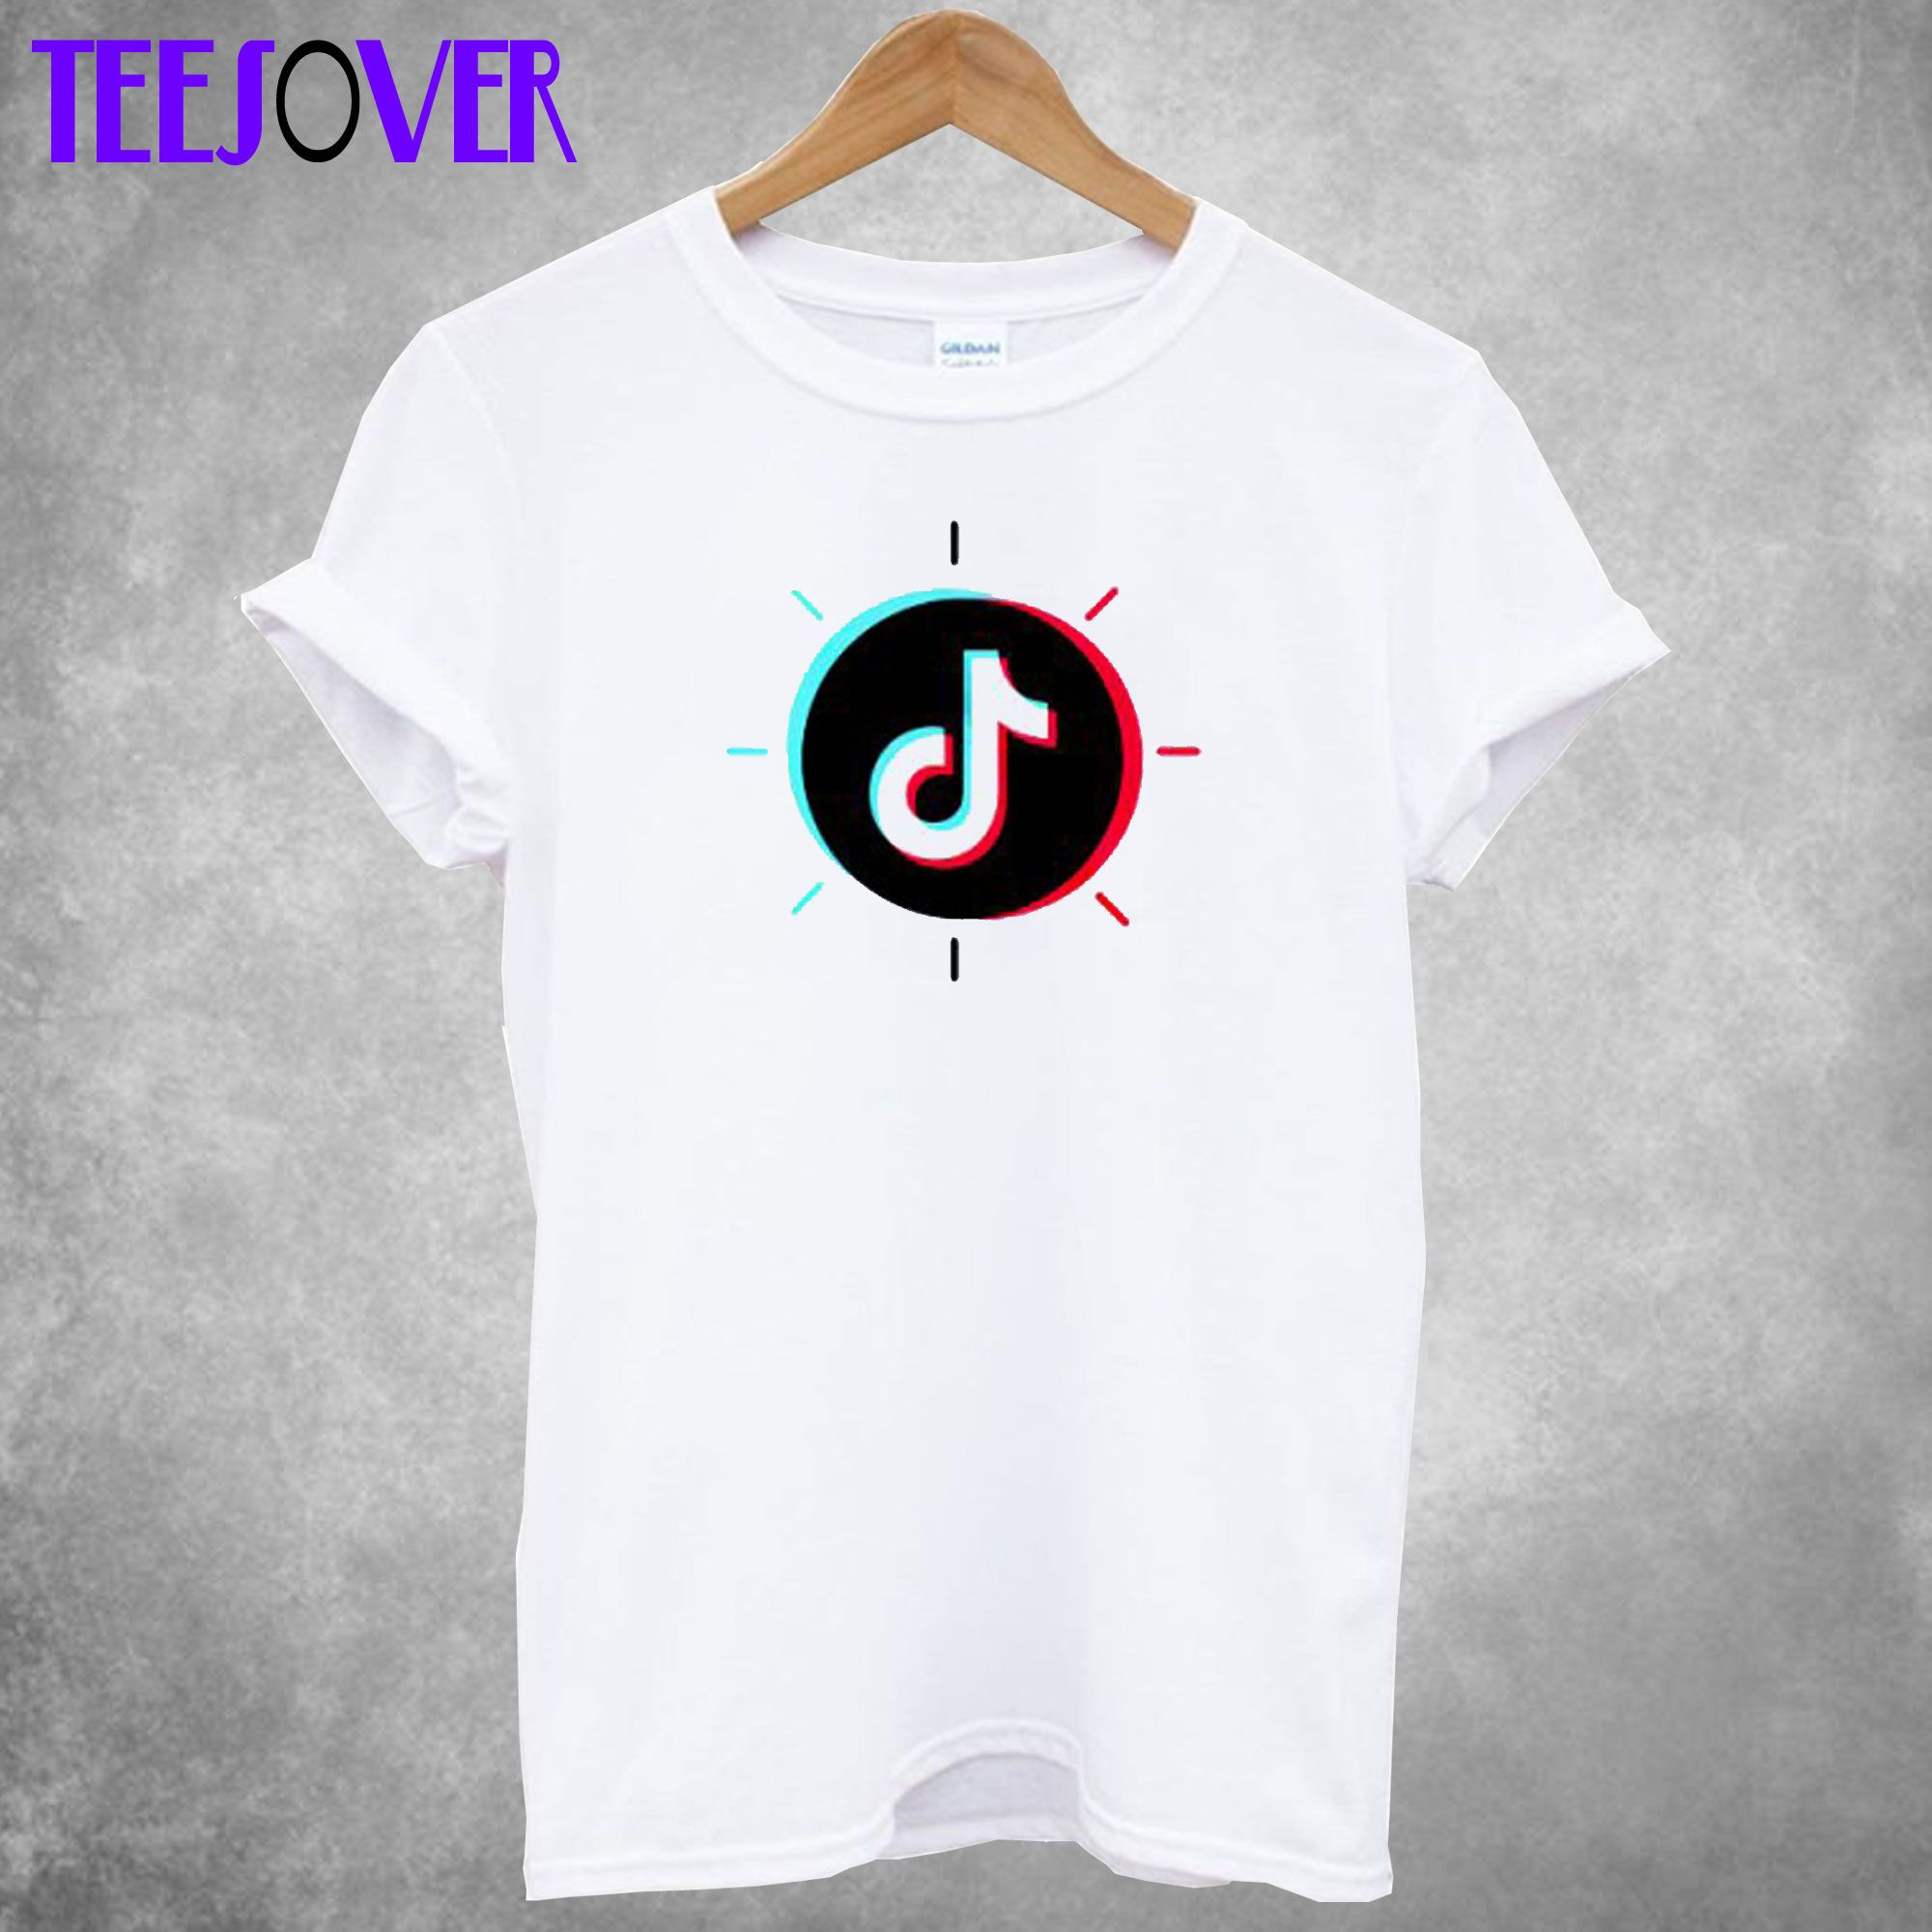 TikTok Circle TShirt in 2020 Shirts, Print clothes, T shirt